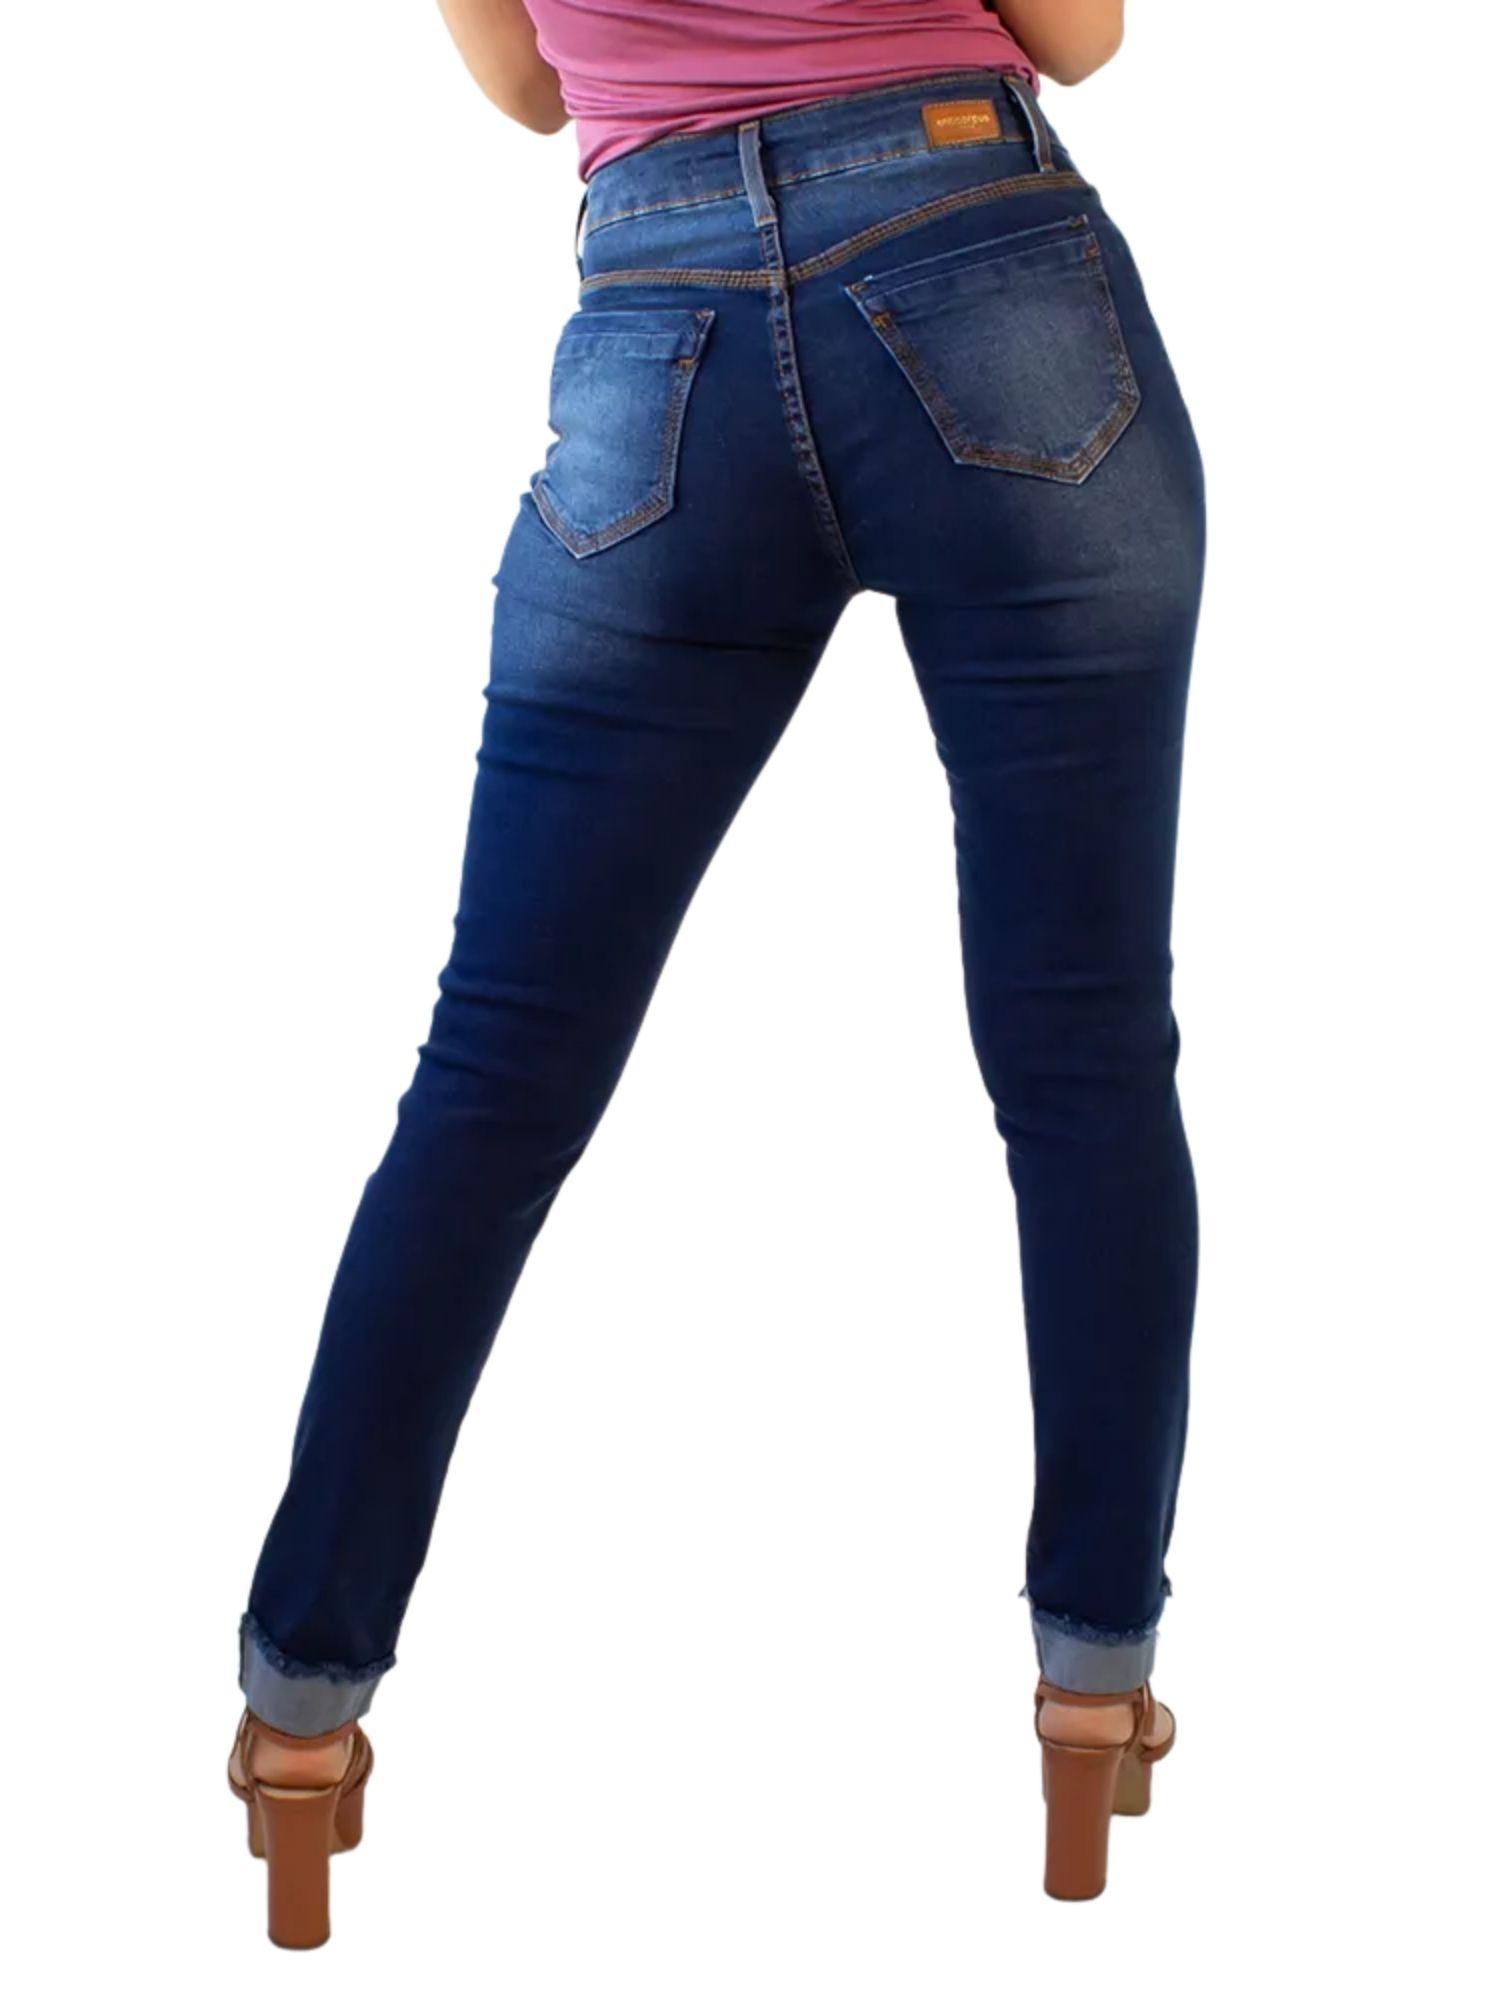 Calça Feminina Skinny Cós Alto Anticorpus  13499